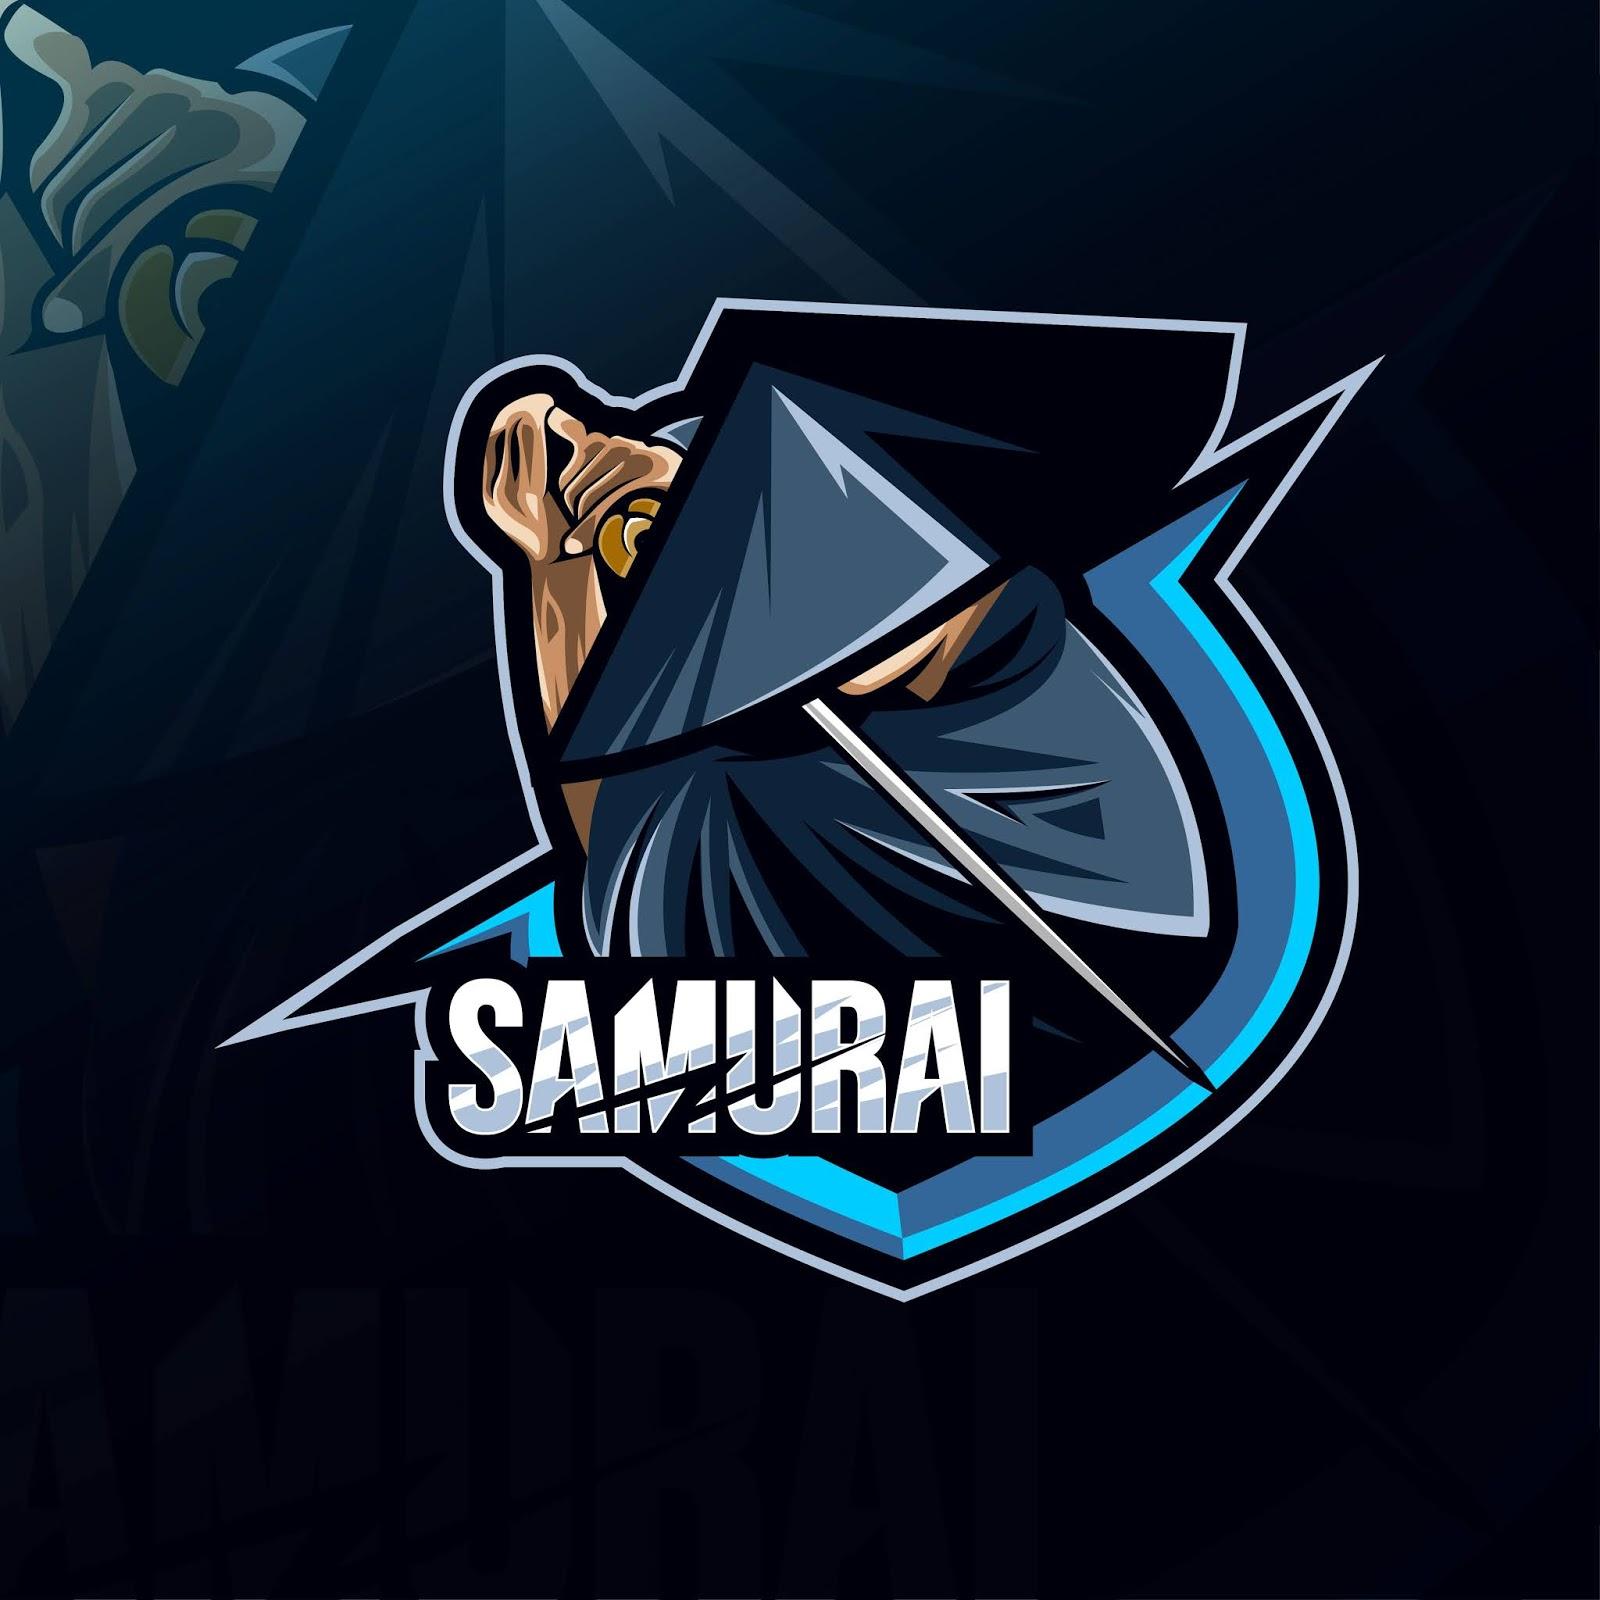 Samurai Mascot Logo Esport Templates Free Download Vector CDR, AI, EPS and PNG Formats